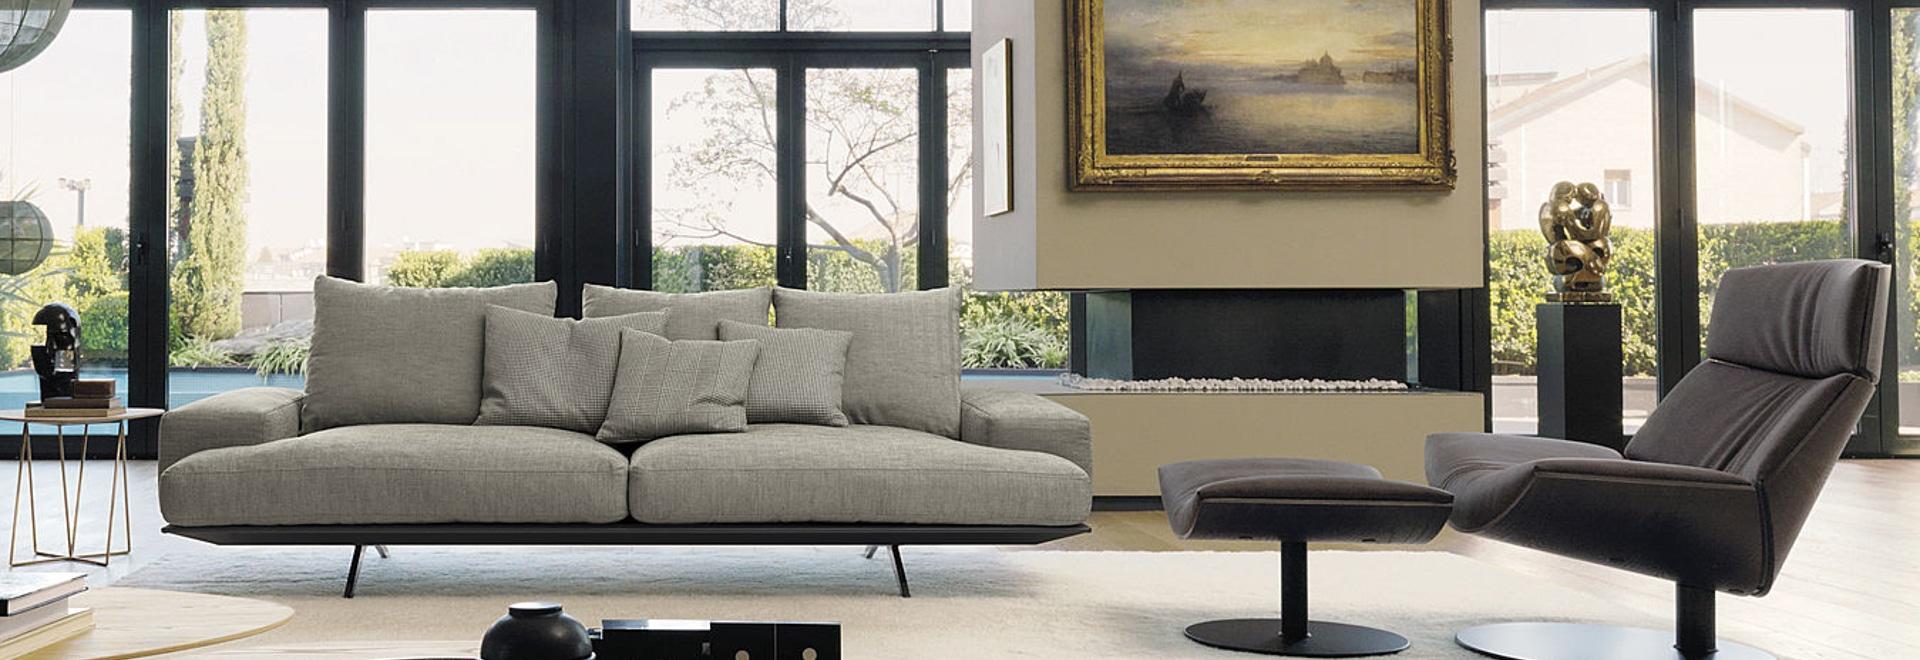 desiree furniture. PLATZ Design R\u0026S Désirée Desiree Furniture